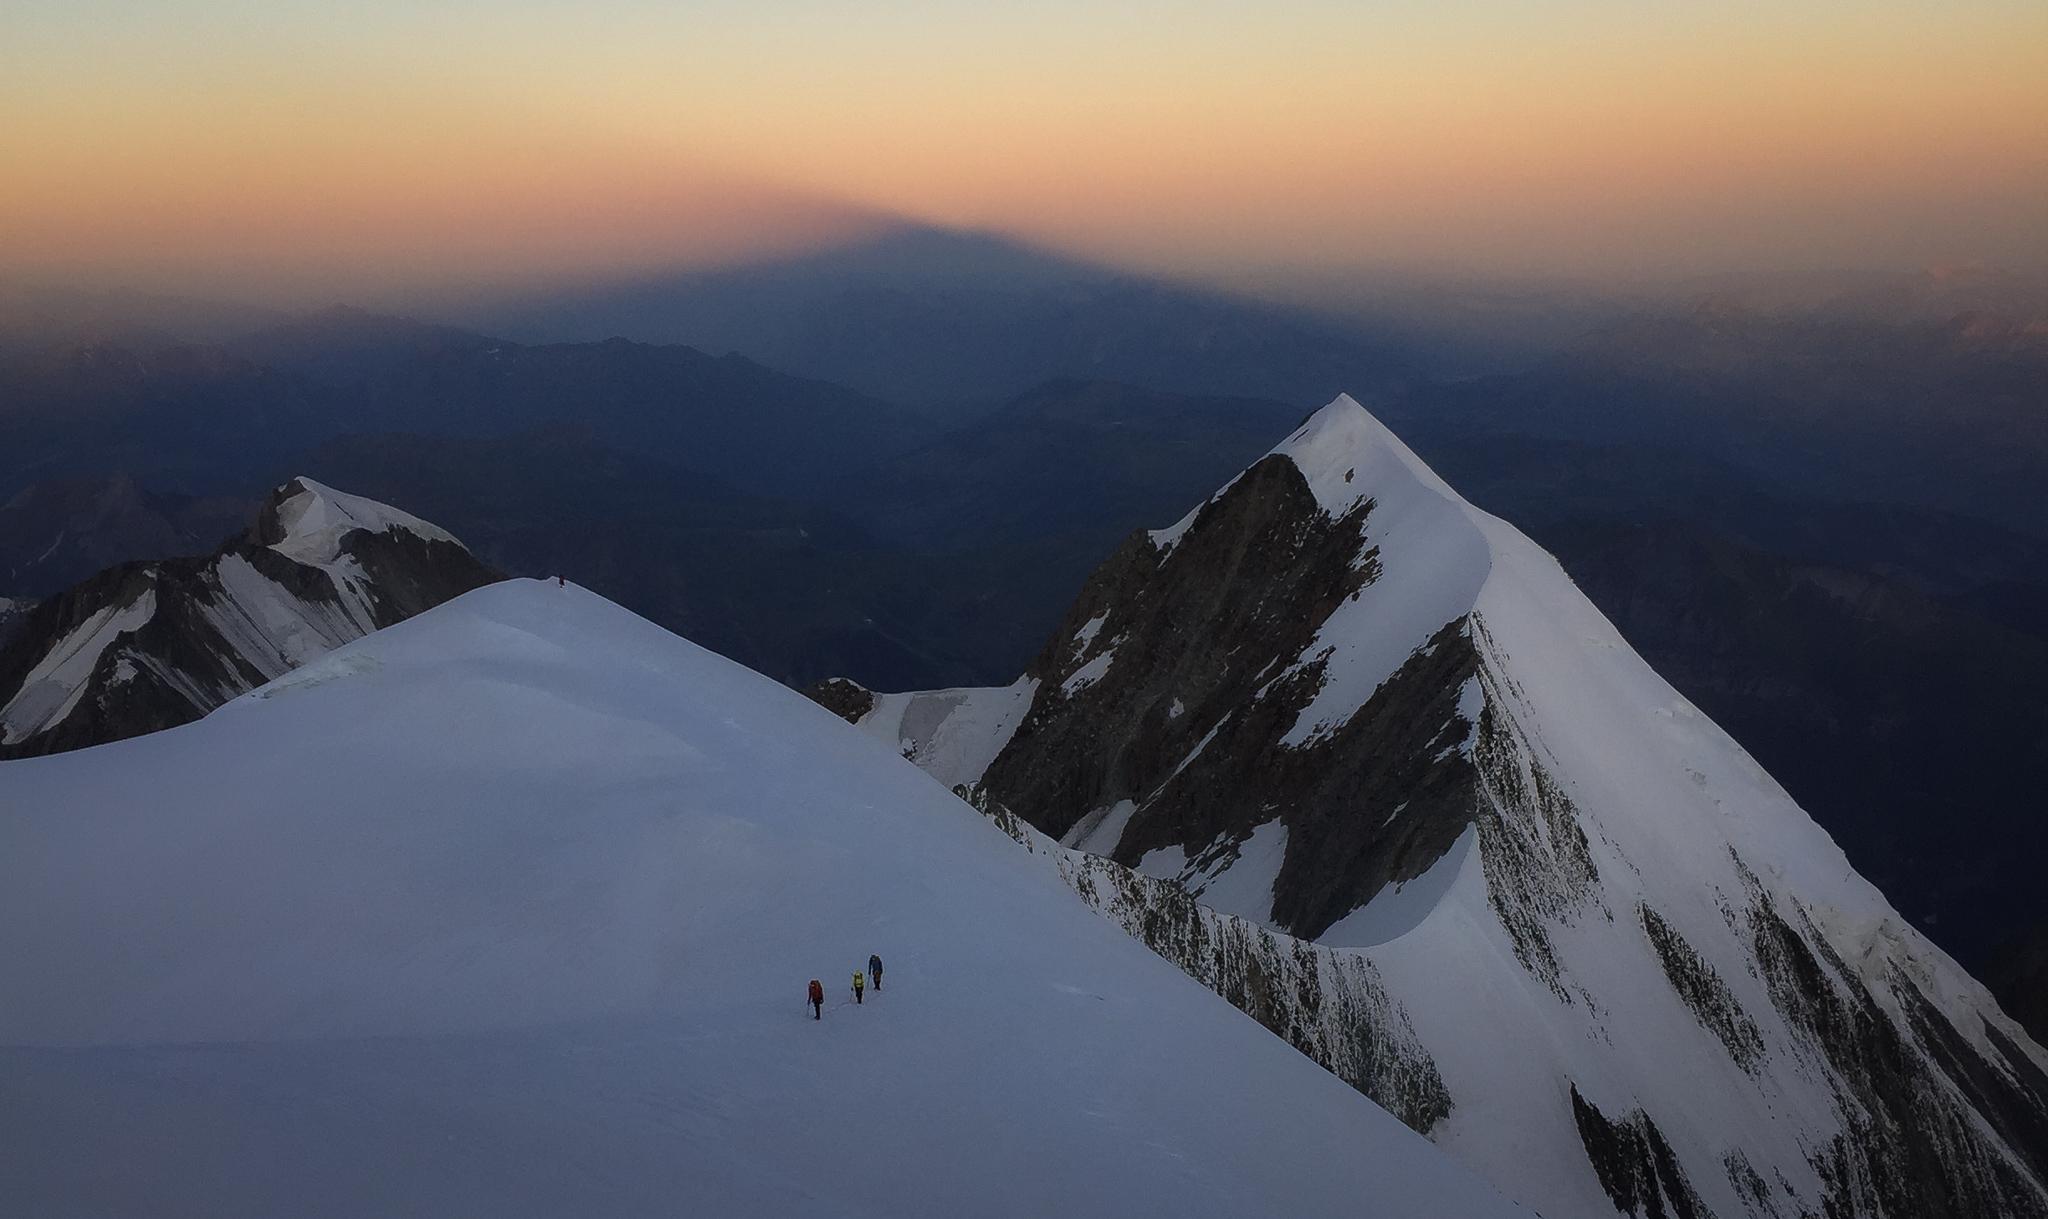 Approaching Glacier